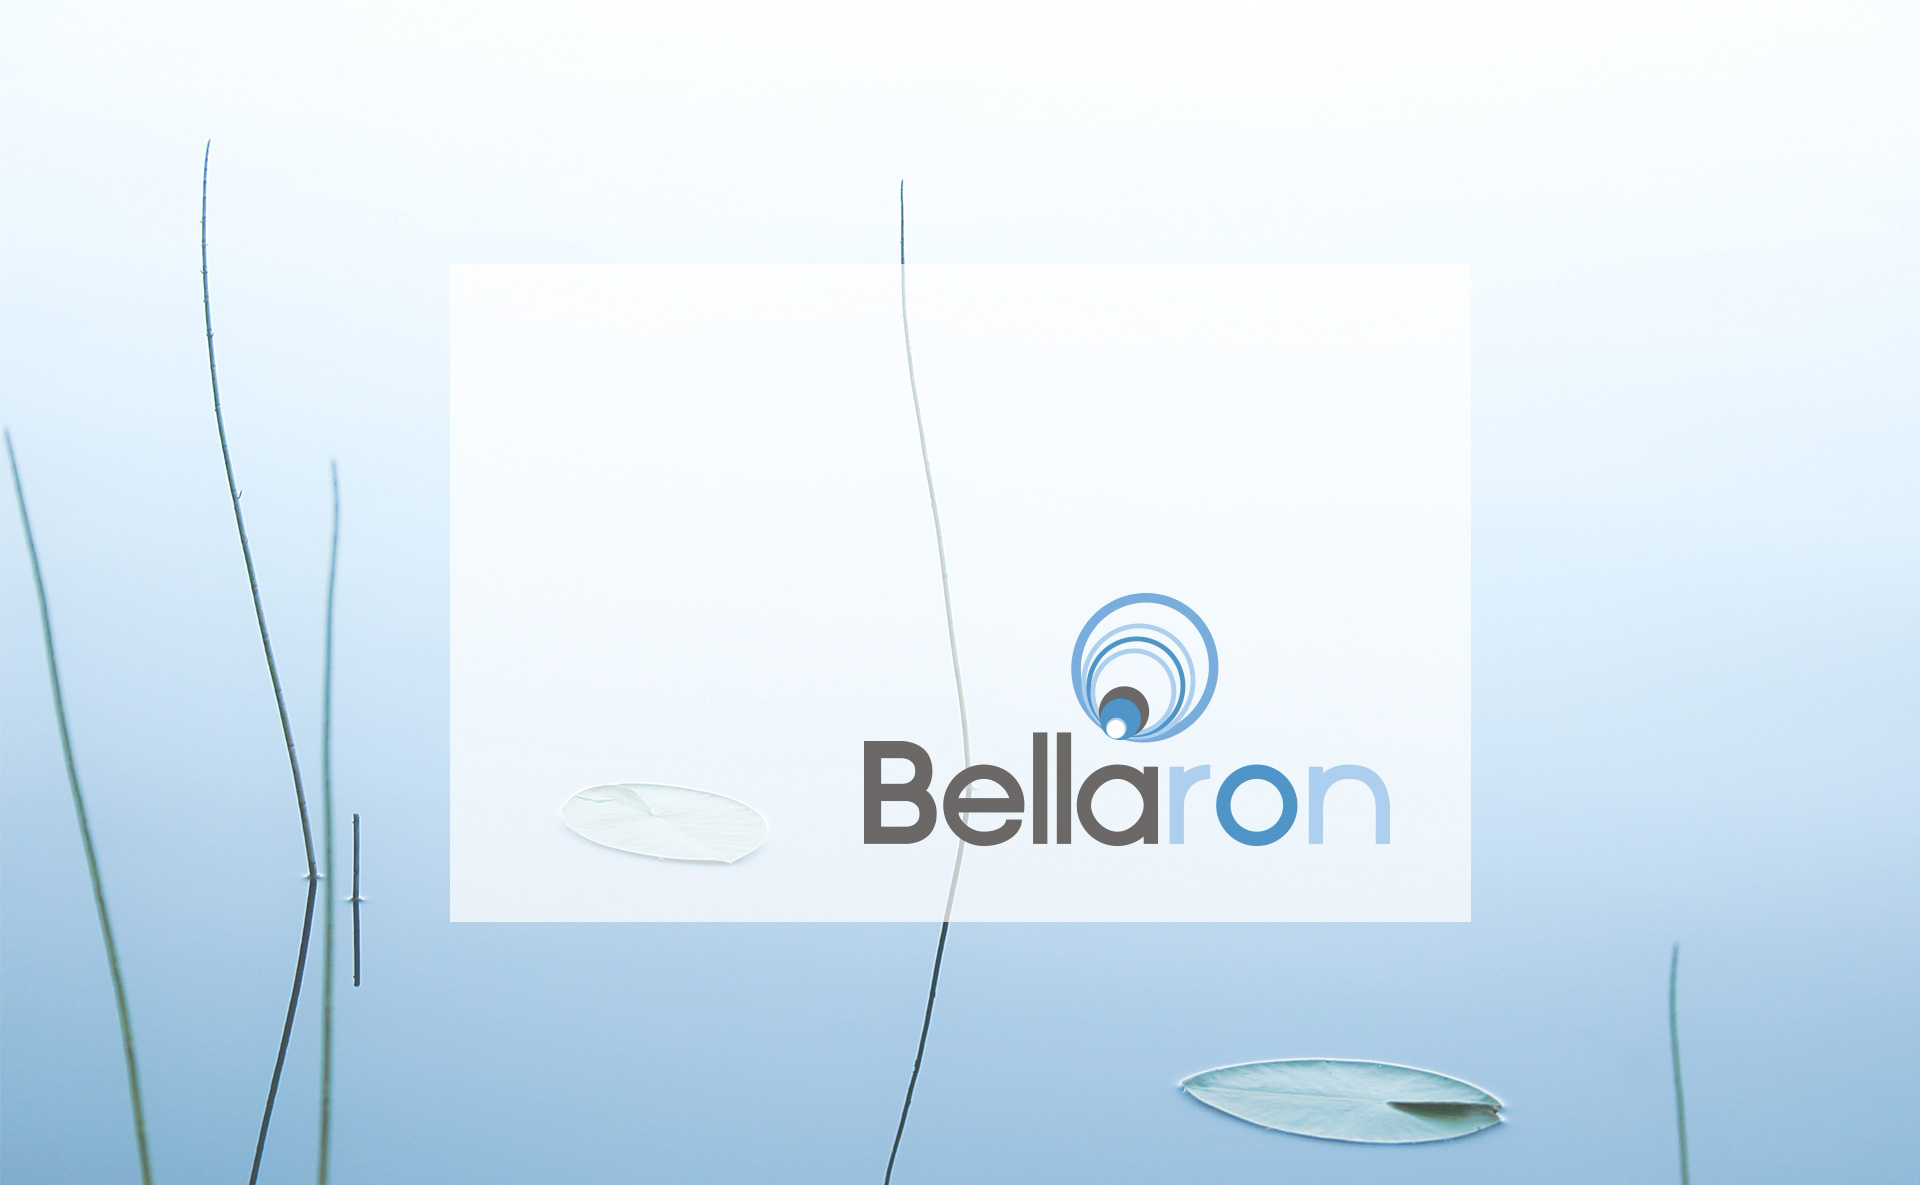 media/image/Startseite_Moodbild_Bellaron_1920x1185px.jpg